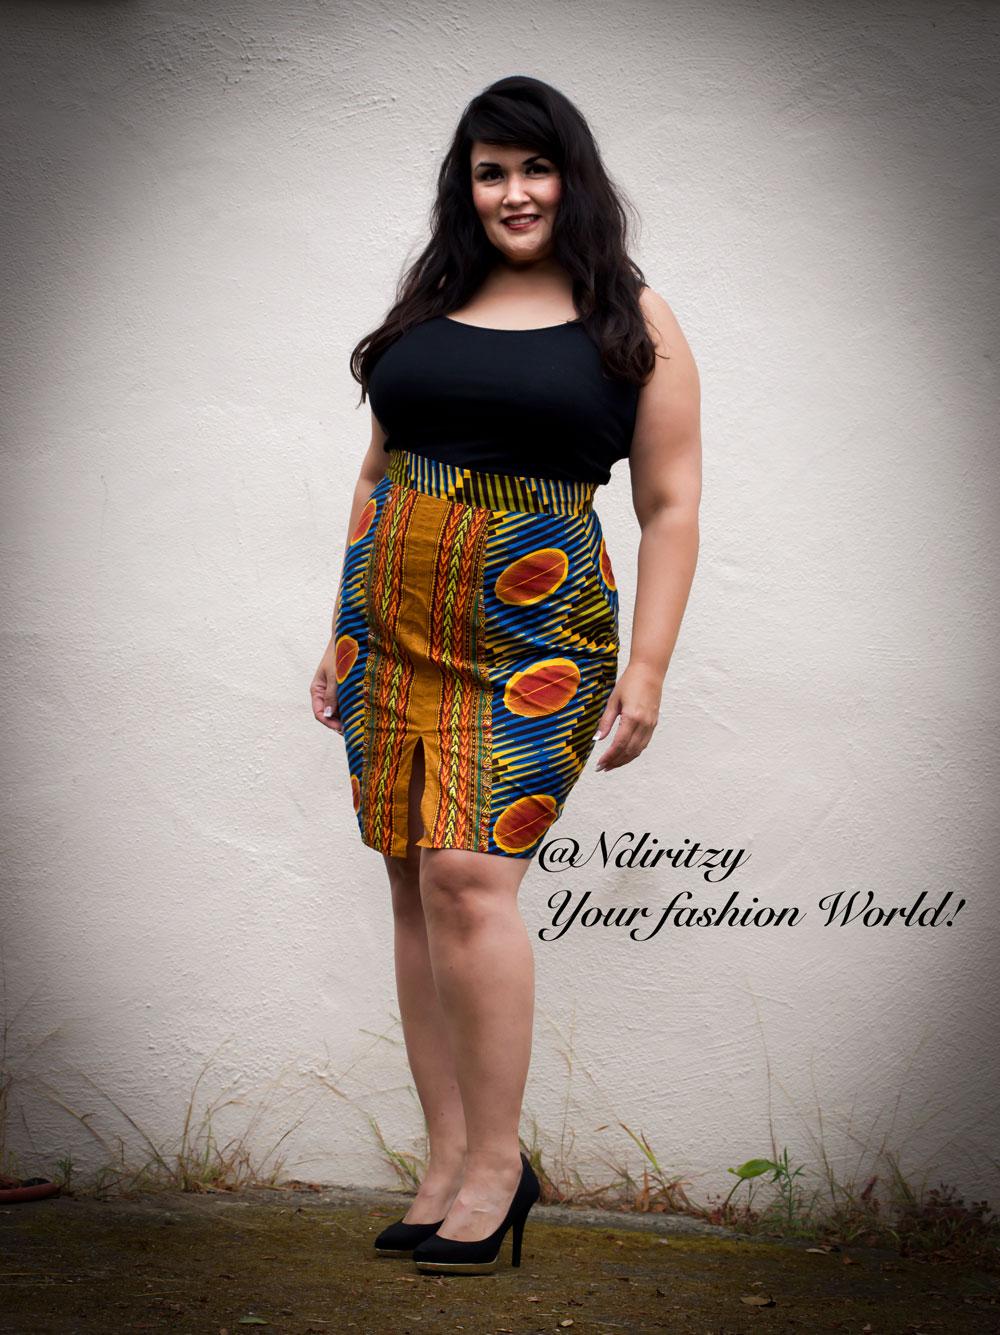 African Print Pencil Skirt Ndiritzy